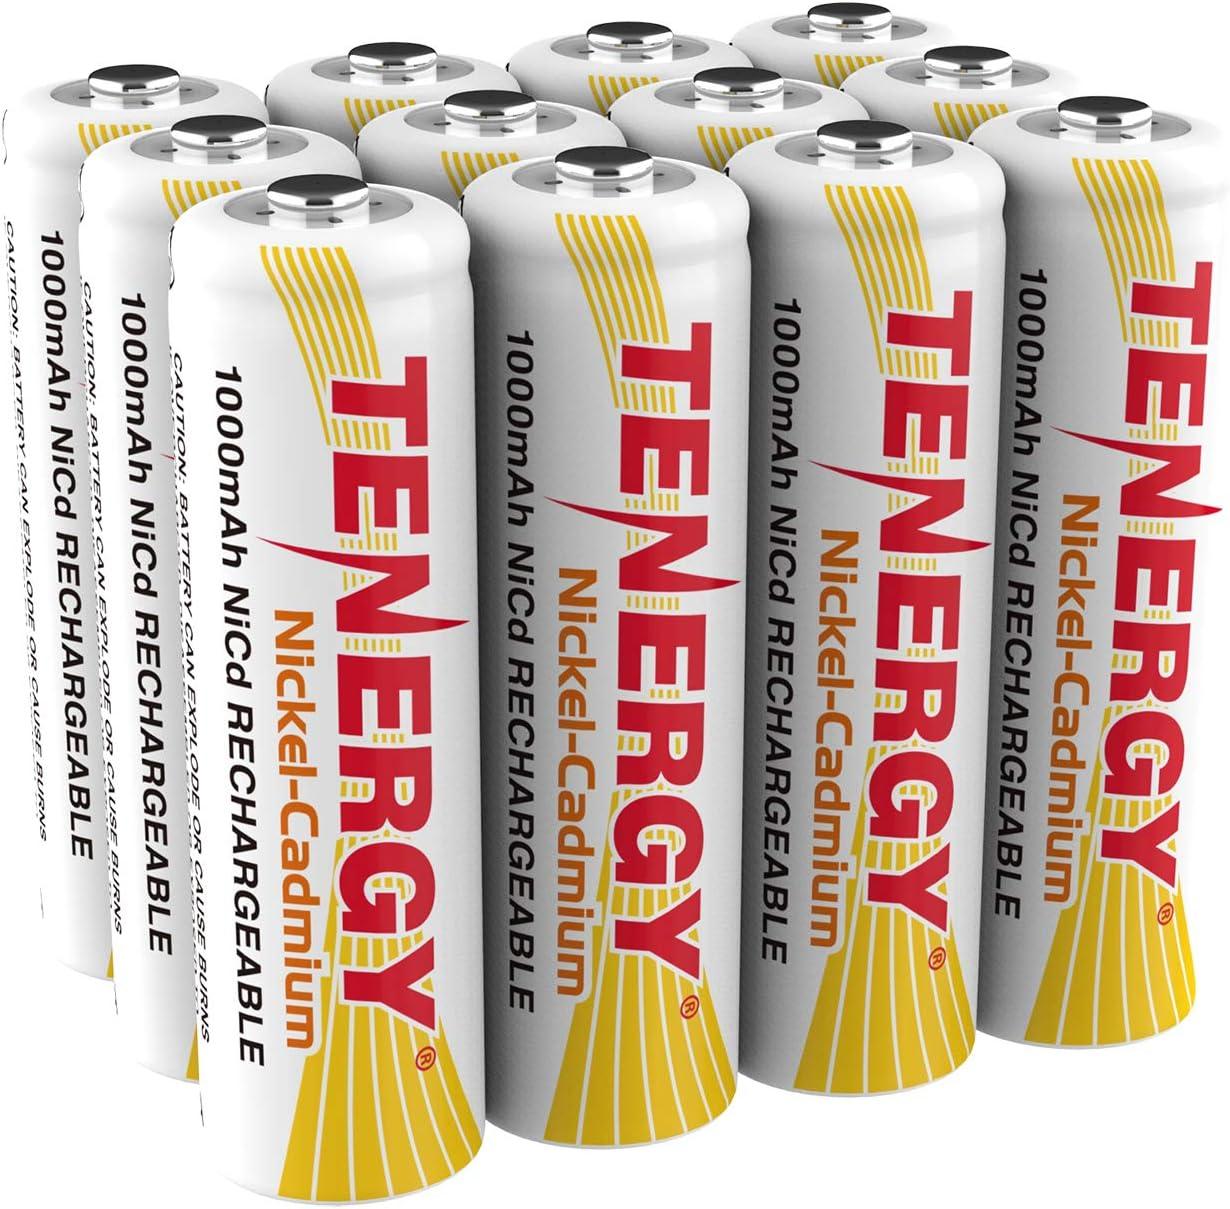 Tenergy – 90300 - Best Rechargeable Batteries